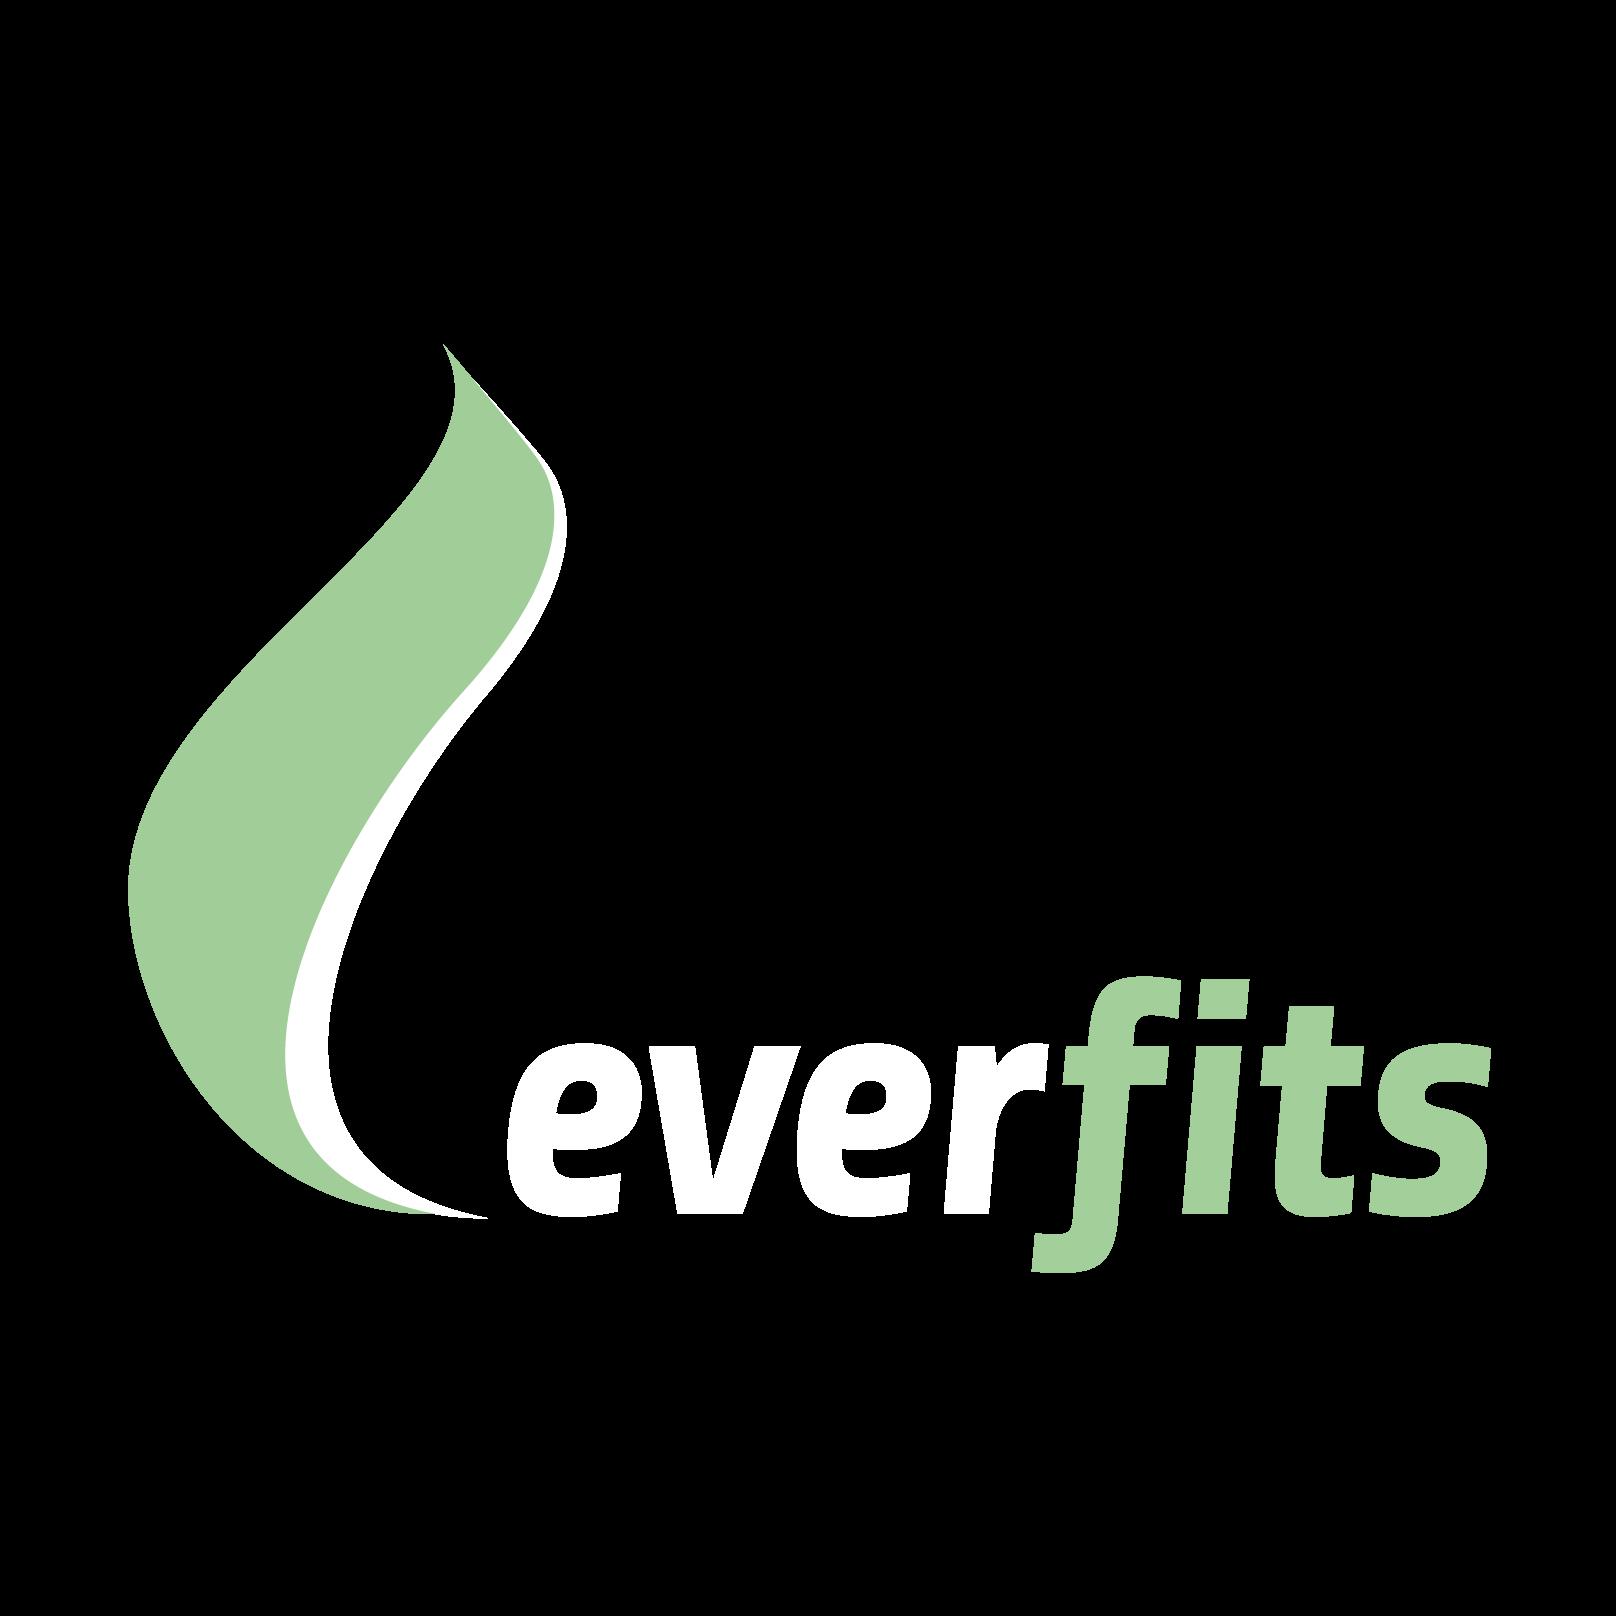 everfits2go